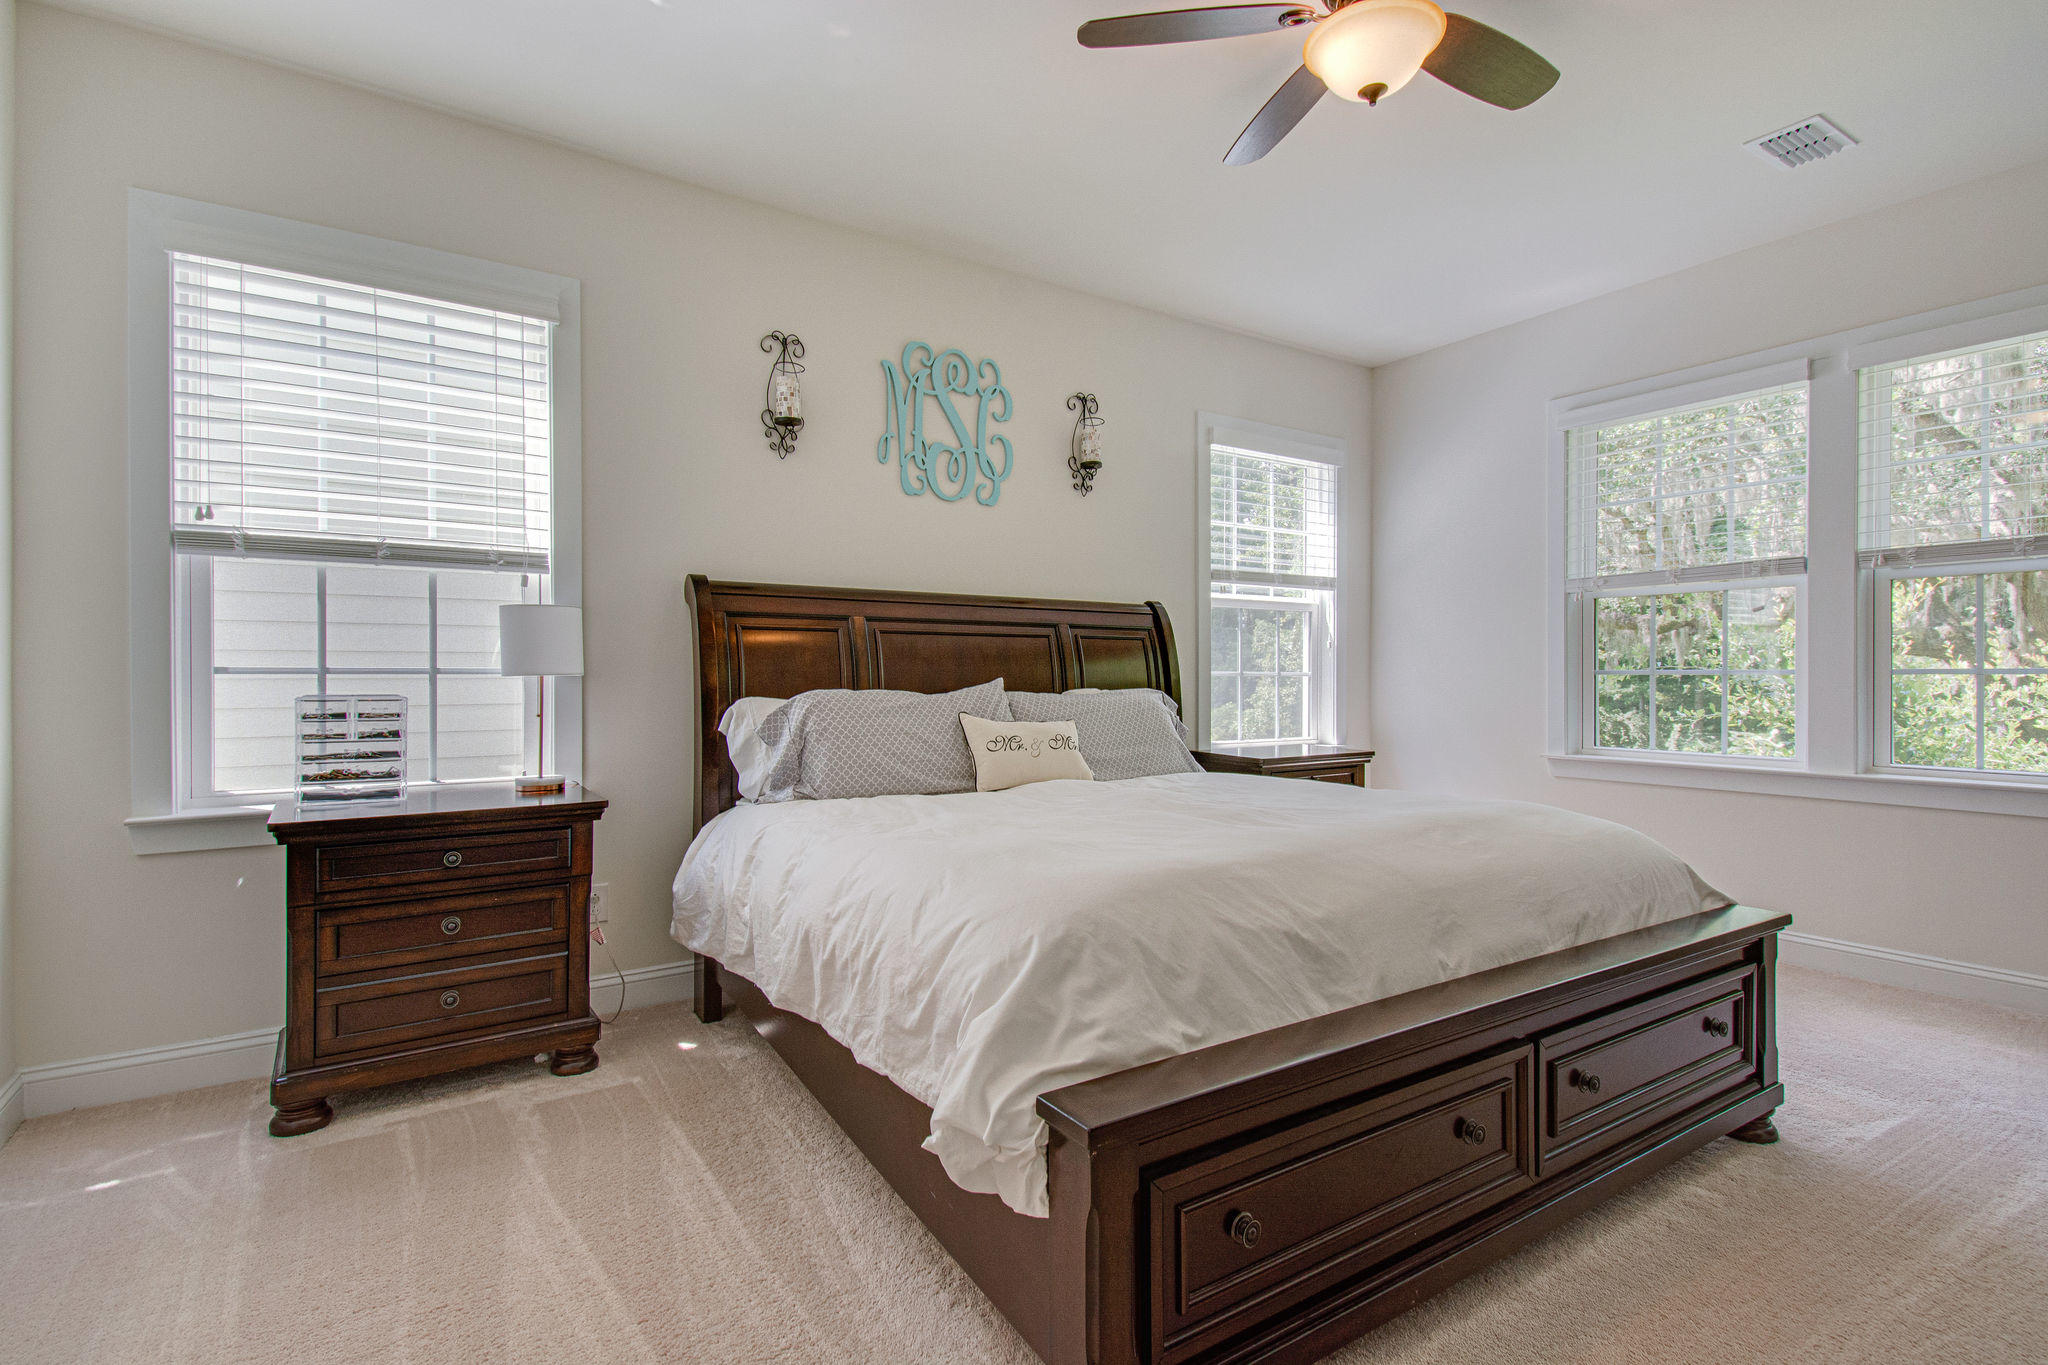 Magnolia Village Homes For Sale - 1261 Pearwood, Mount Pleasant, SC - 15